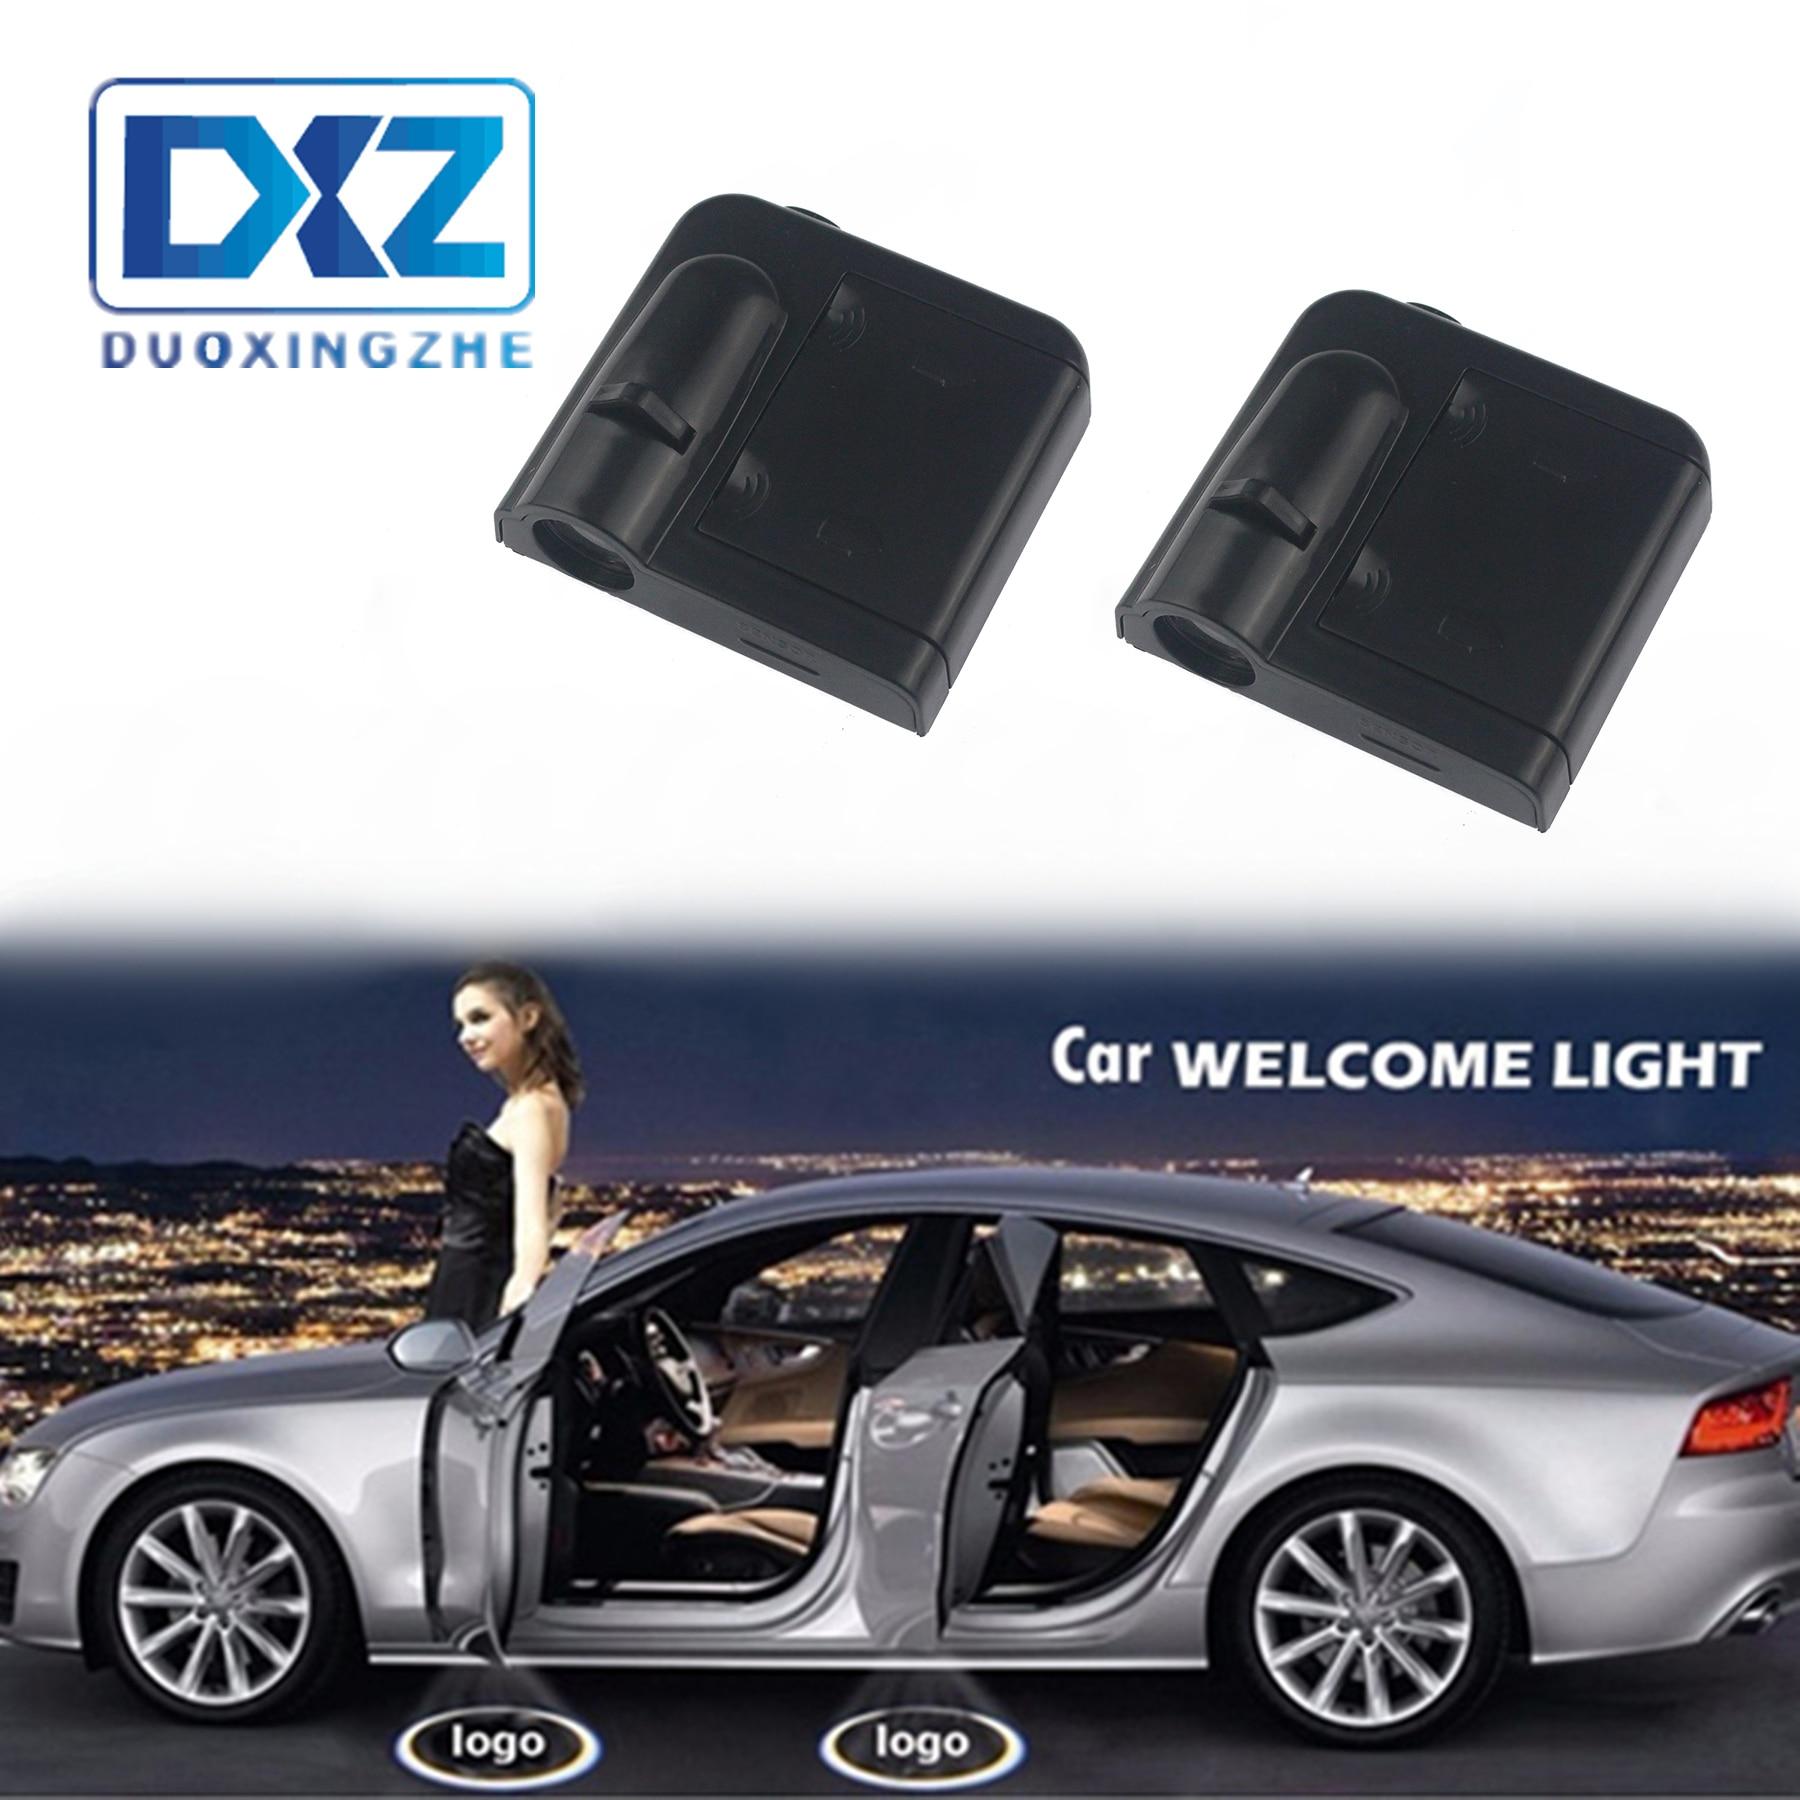 DXZ 2pcs Car Door Welcome Light Projector Logo For Honda Mazda Kia Lada Citroen Suzuki Hyundai Volvo Seat Skoda Peugeot Renault